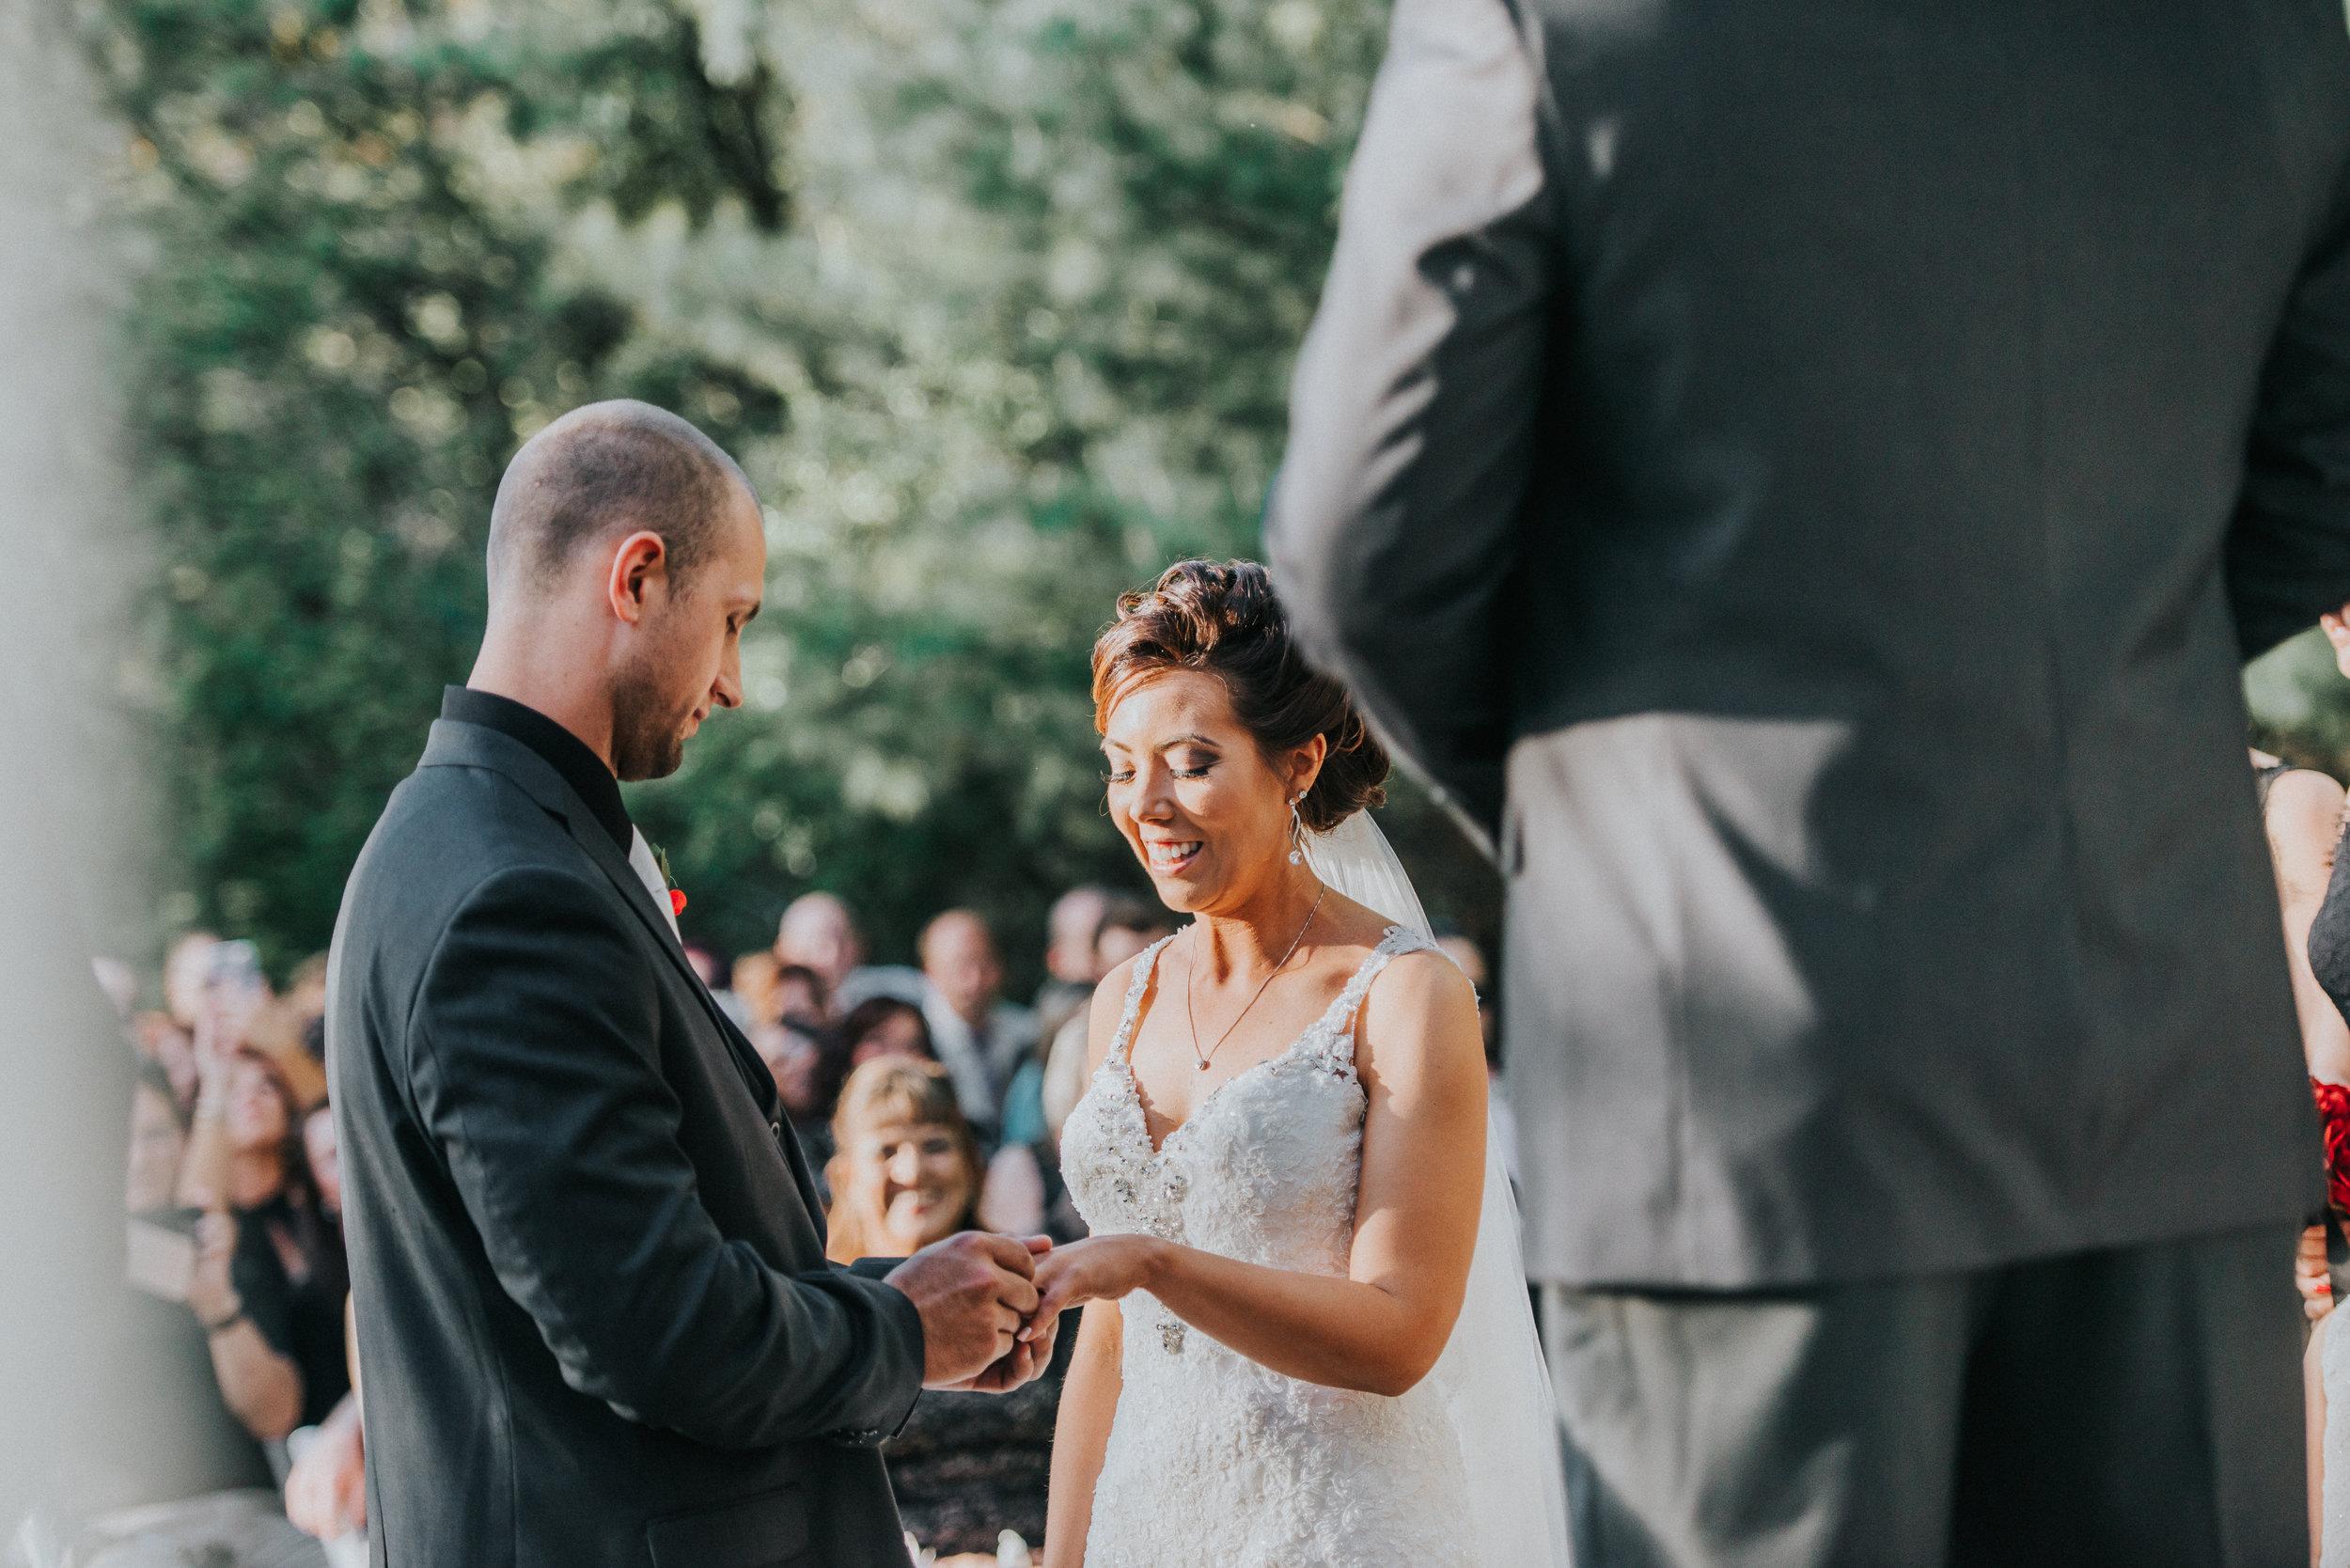 Christina-and-Gene-Wedding-Marla-Rain-Photography-334.jpg